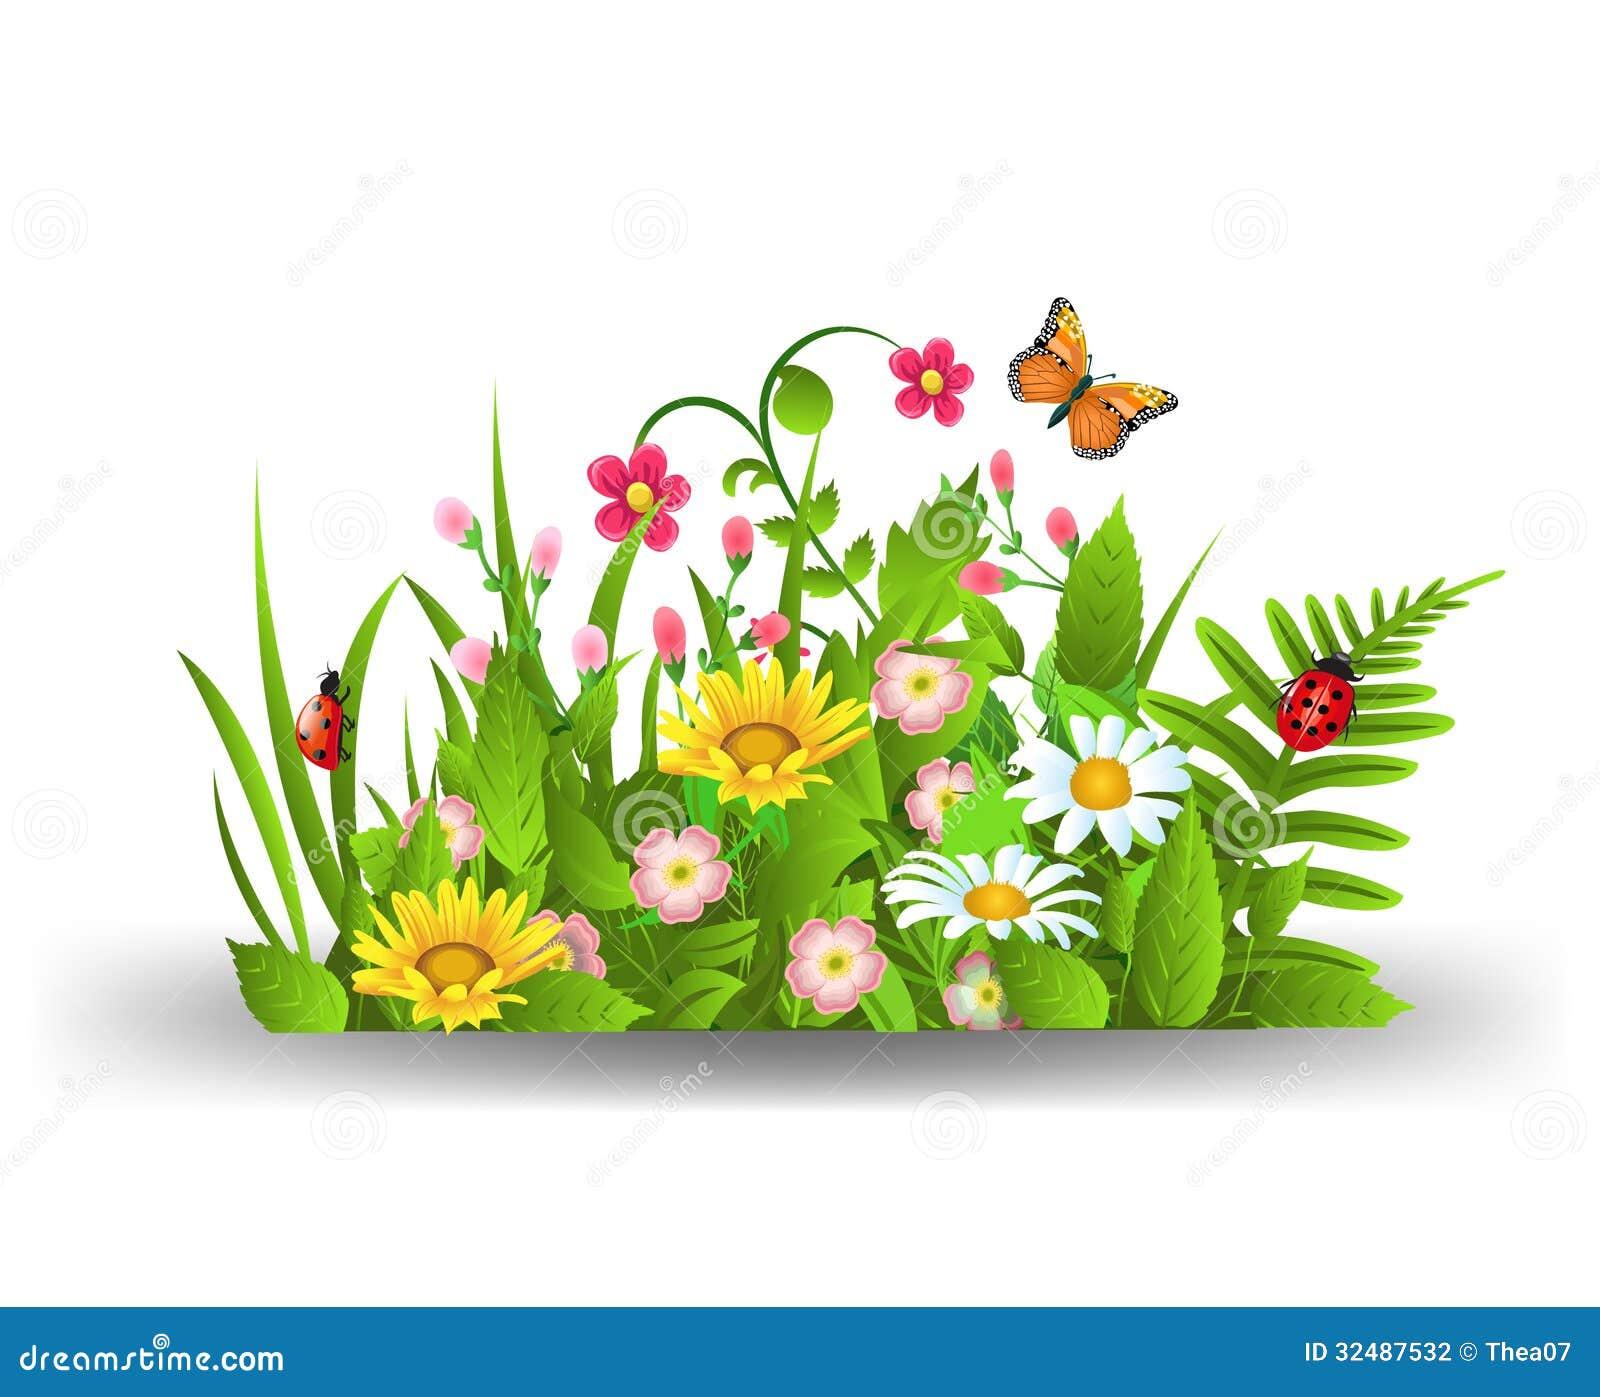 Summer flowers stock photo. Image of bush, nature, green ...